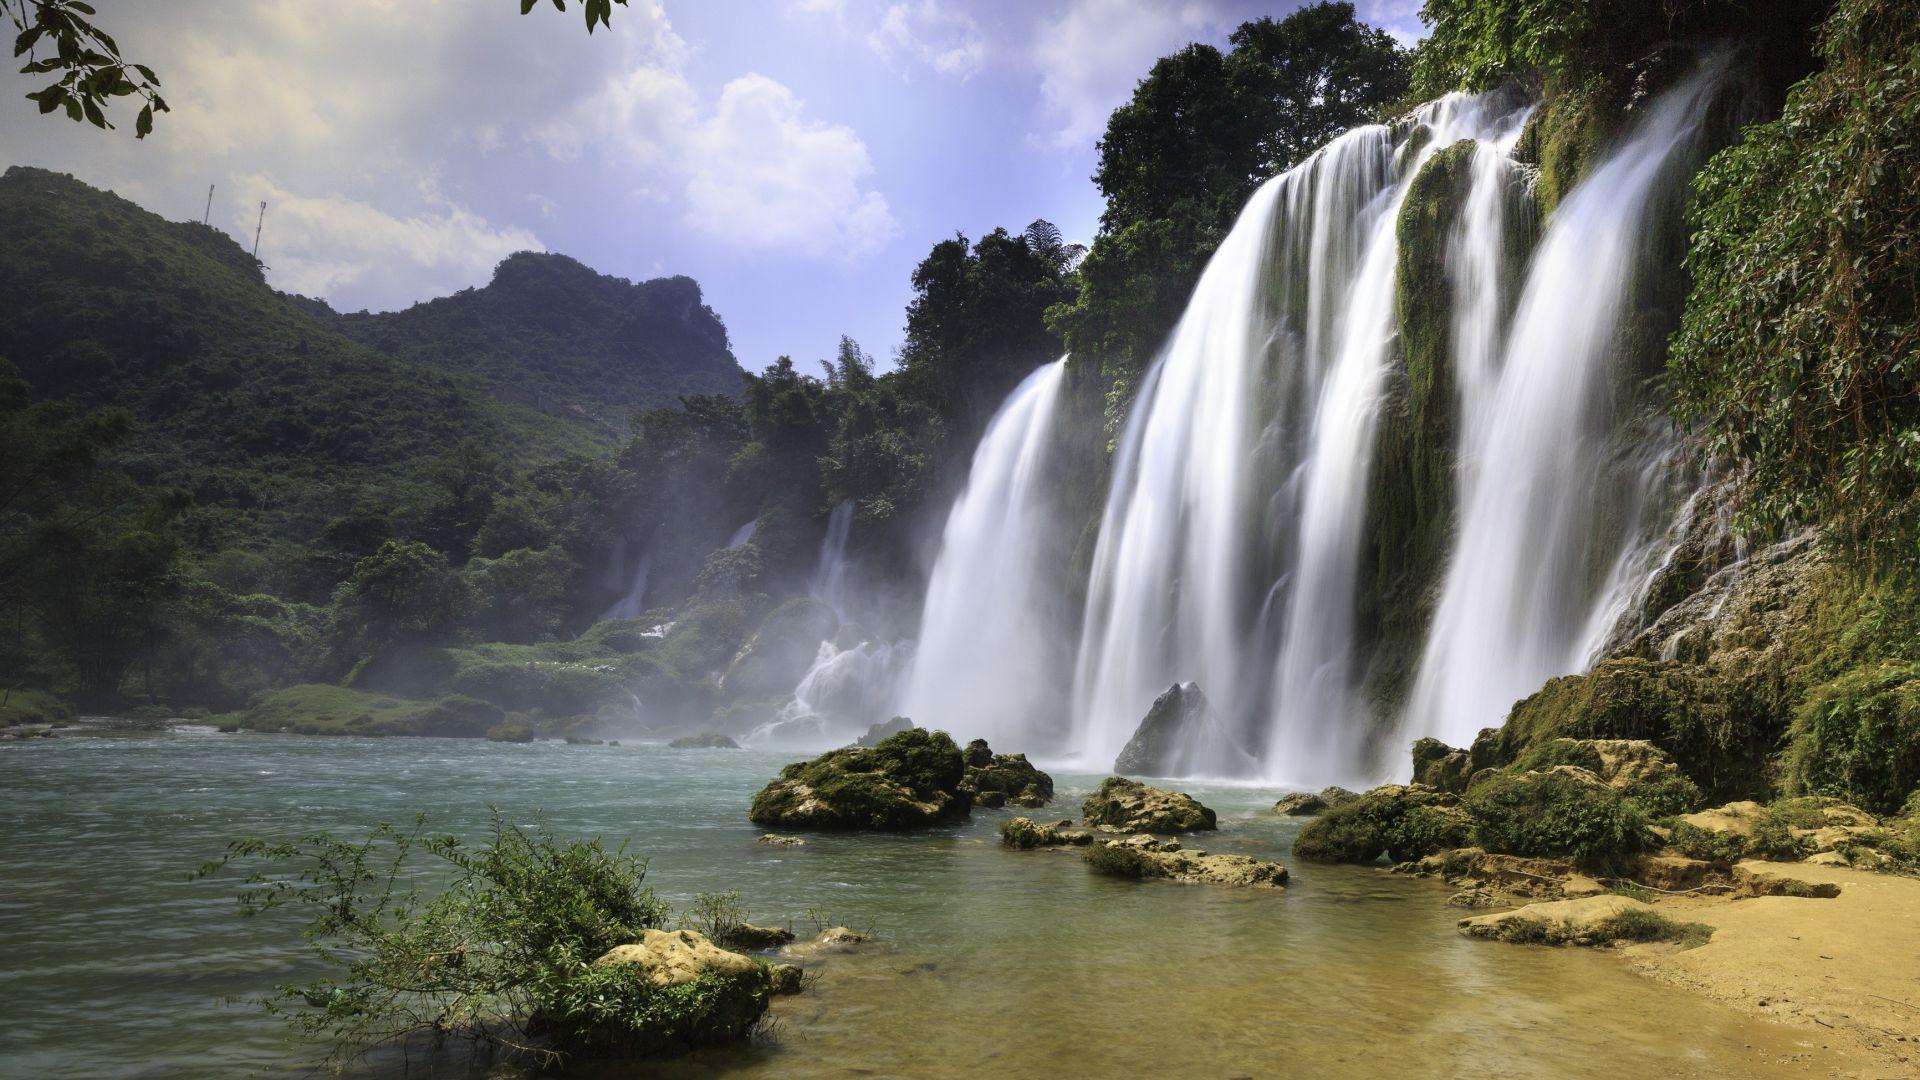 Desktop Wallpaper Nature Waterfall River 4k Hd Image Picture Background Af5d90